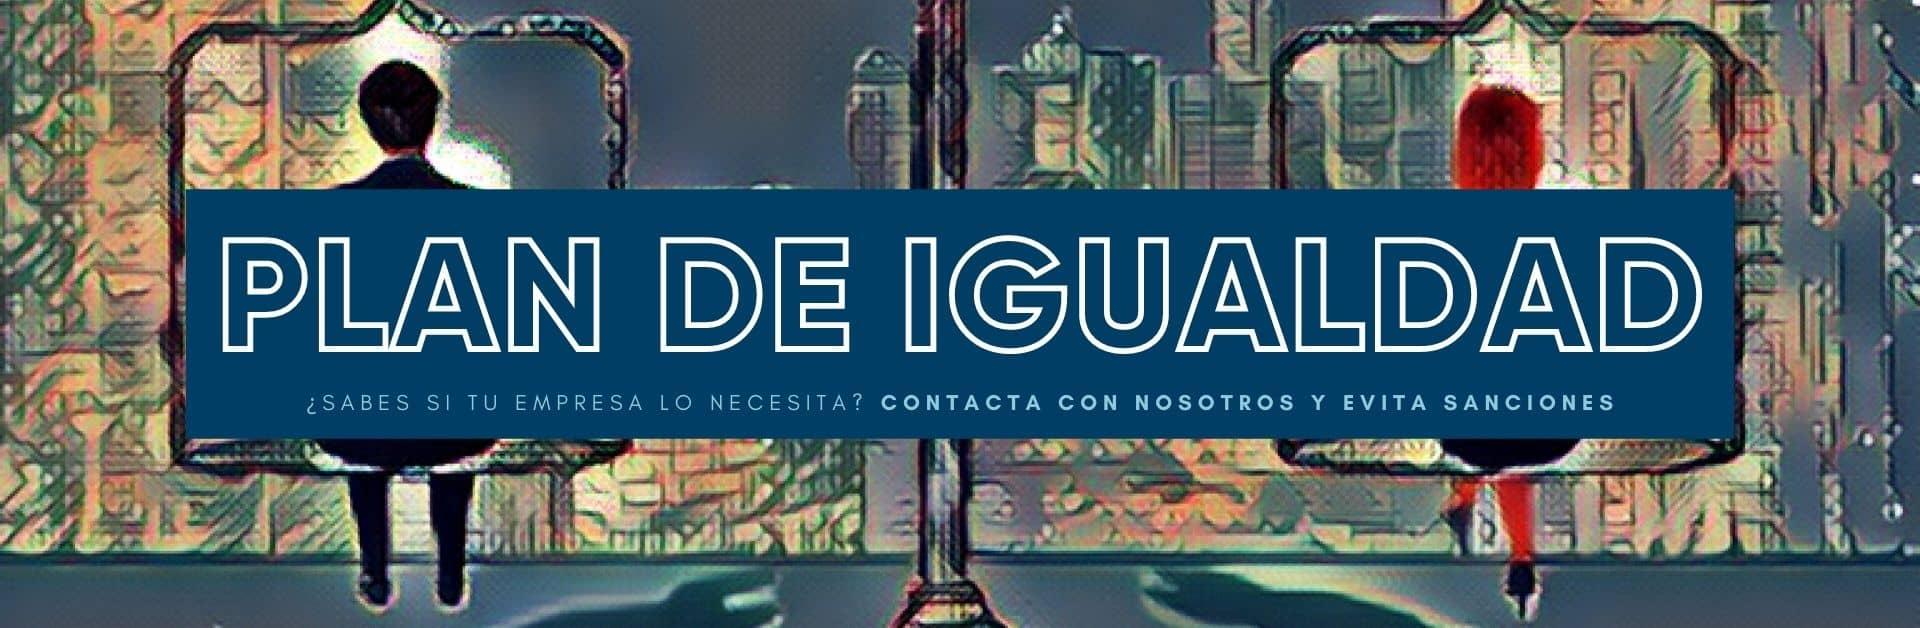 cabecera web pc cyb jul 21 (3)